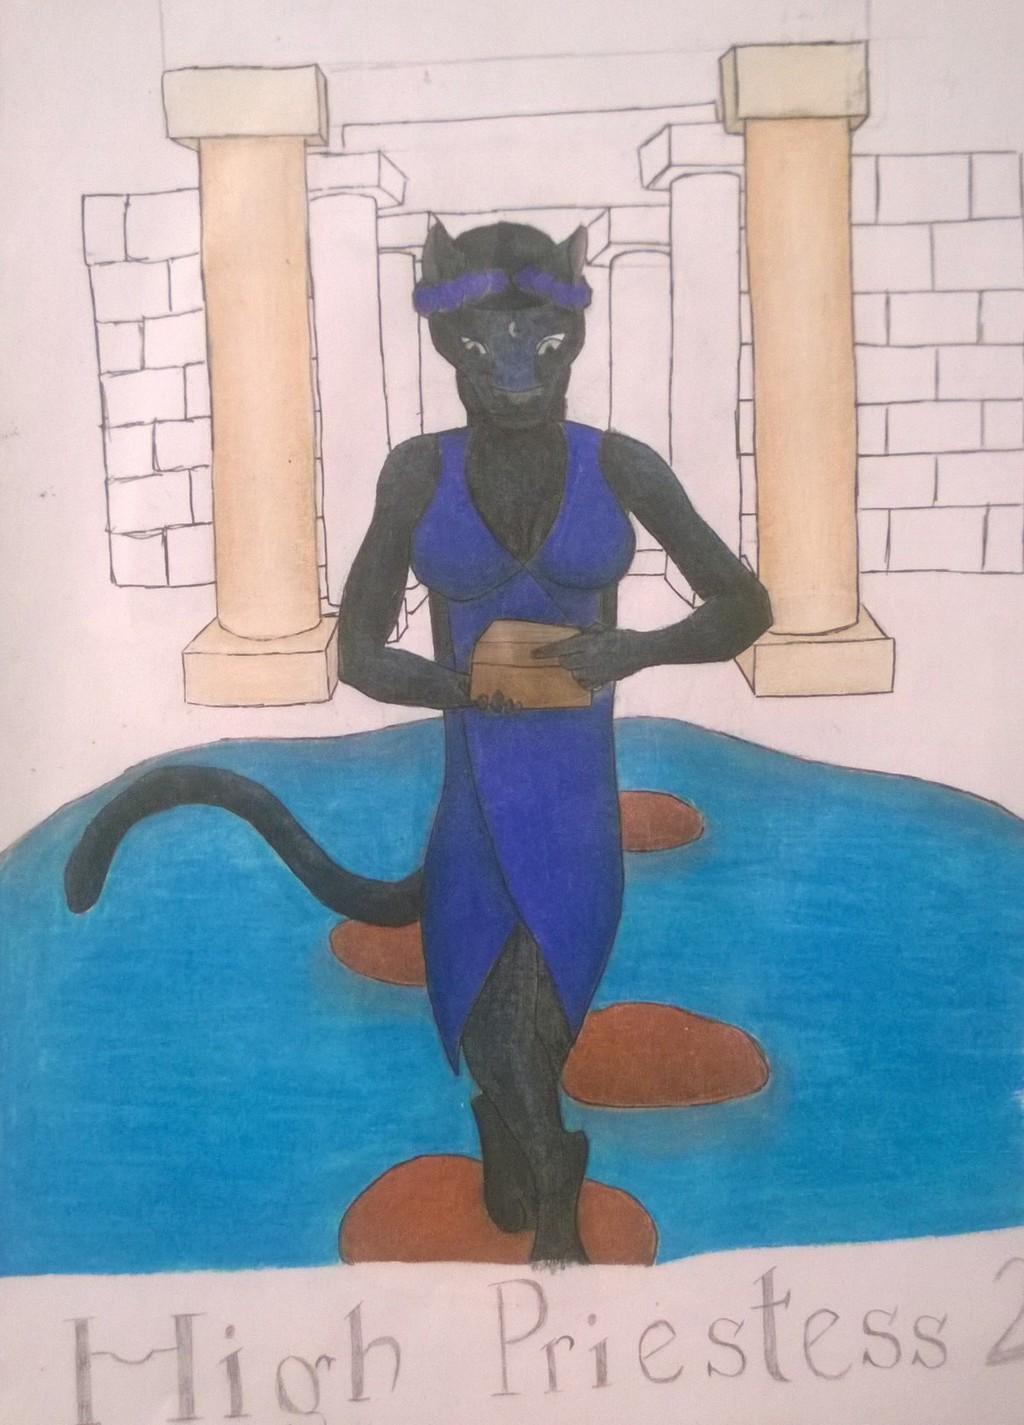 Anthro Tarot Deck The High Priestess